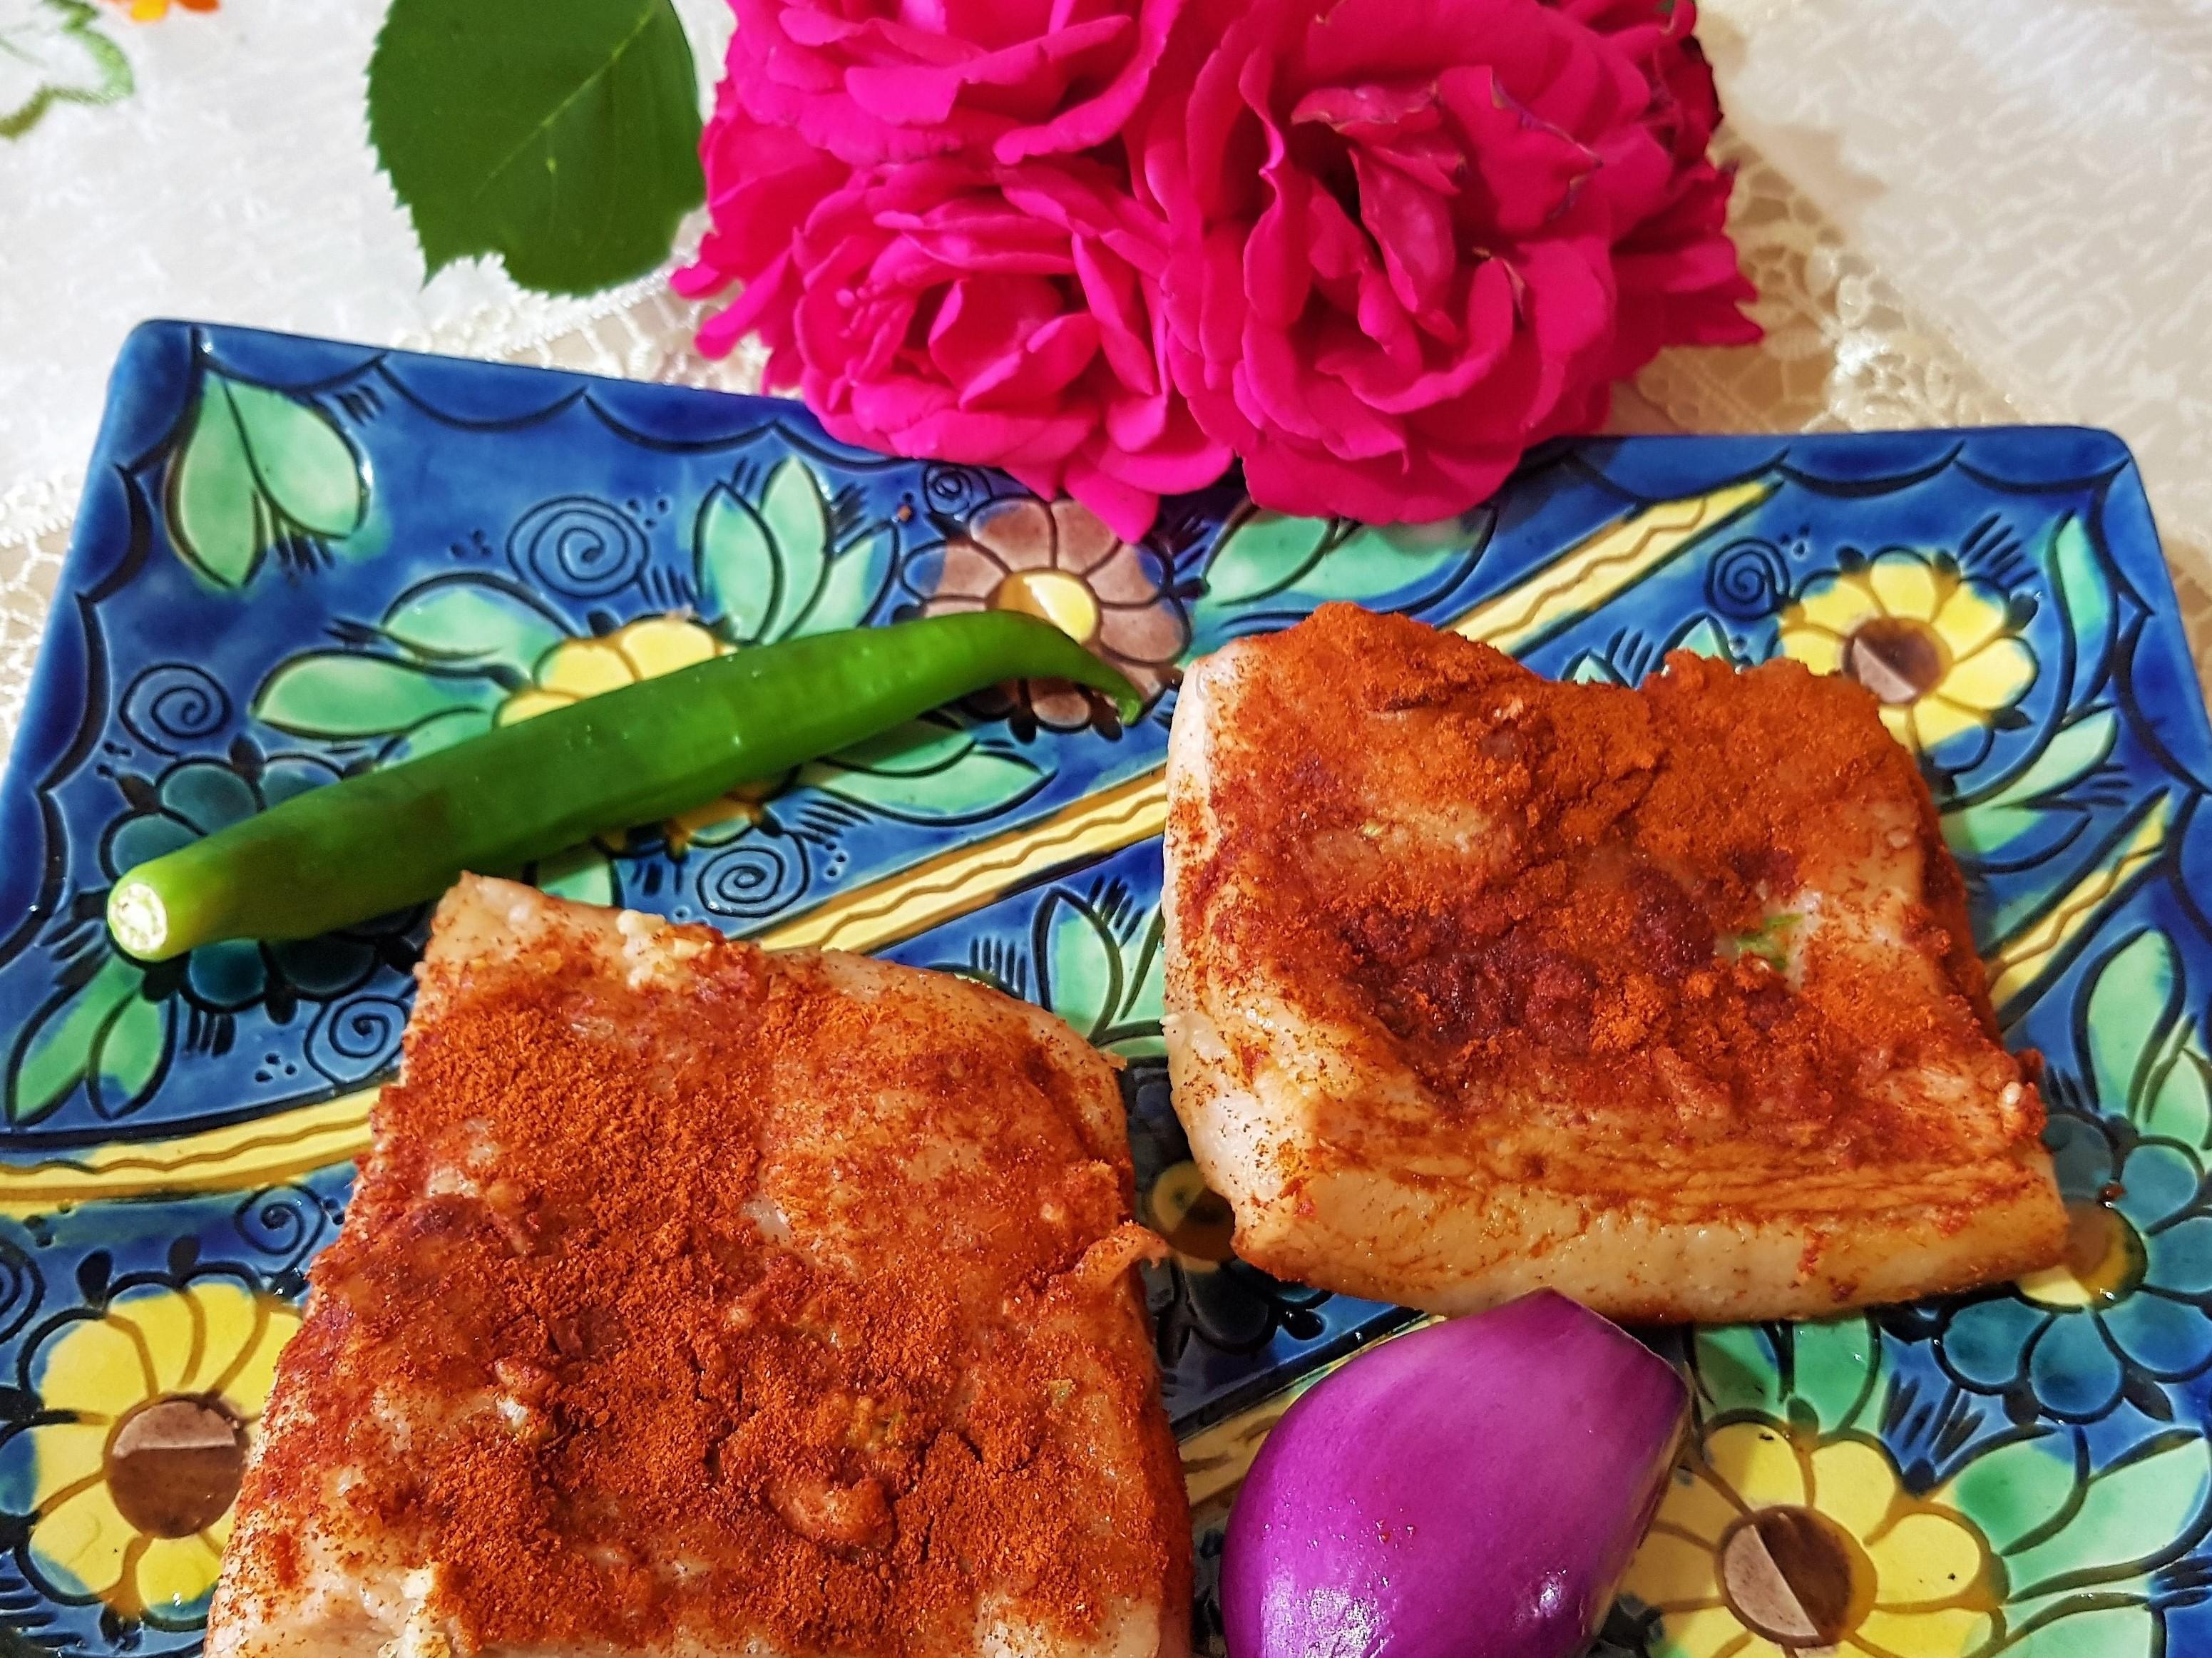 Slanina cu usturoi si boia - fiarta in coji de ceapa rosie